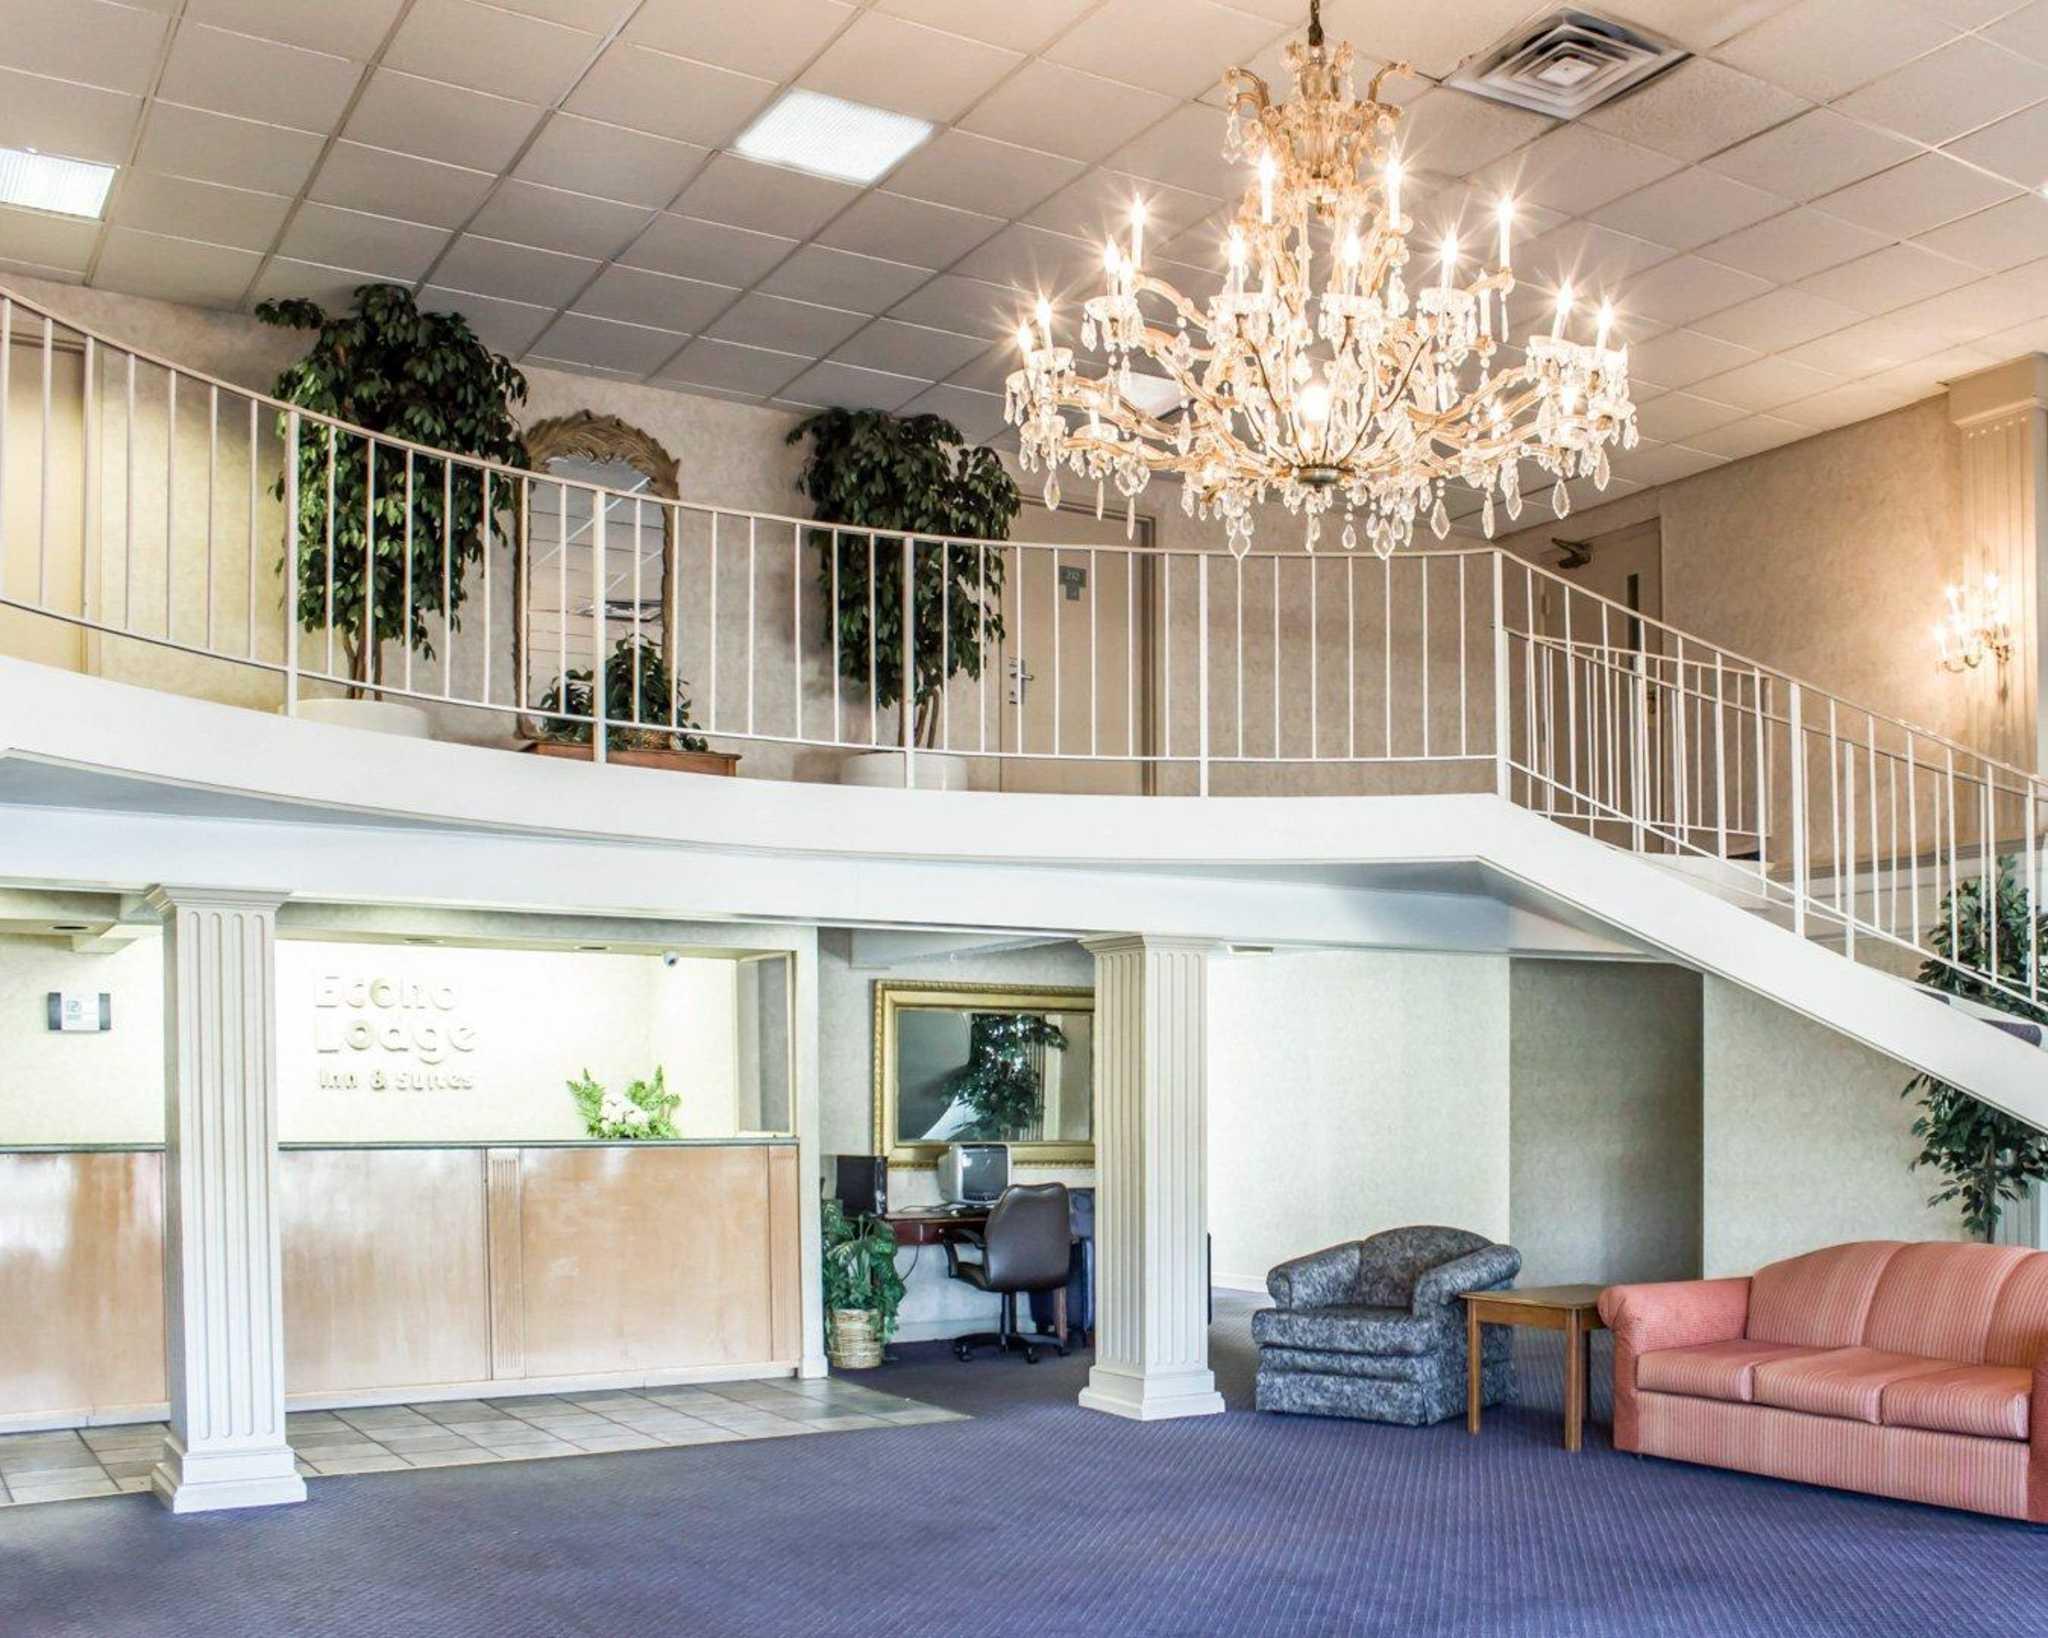 Econo Lodge & Suites image 16